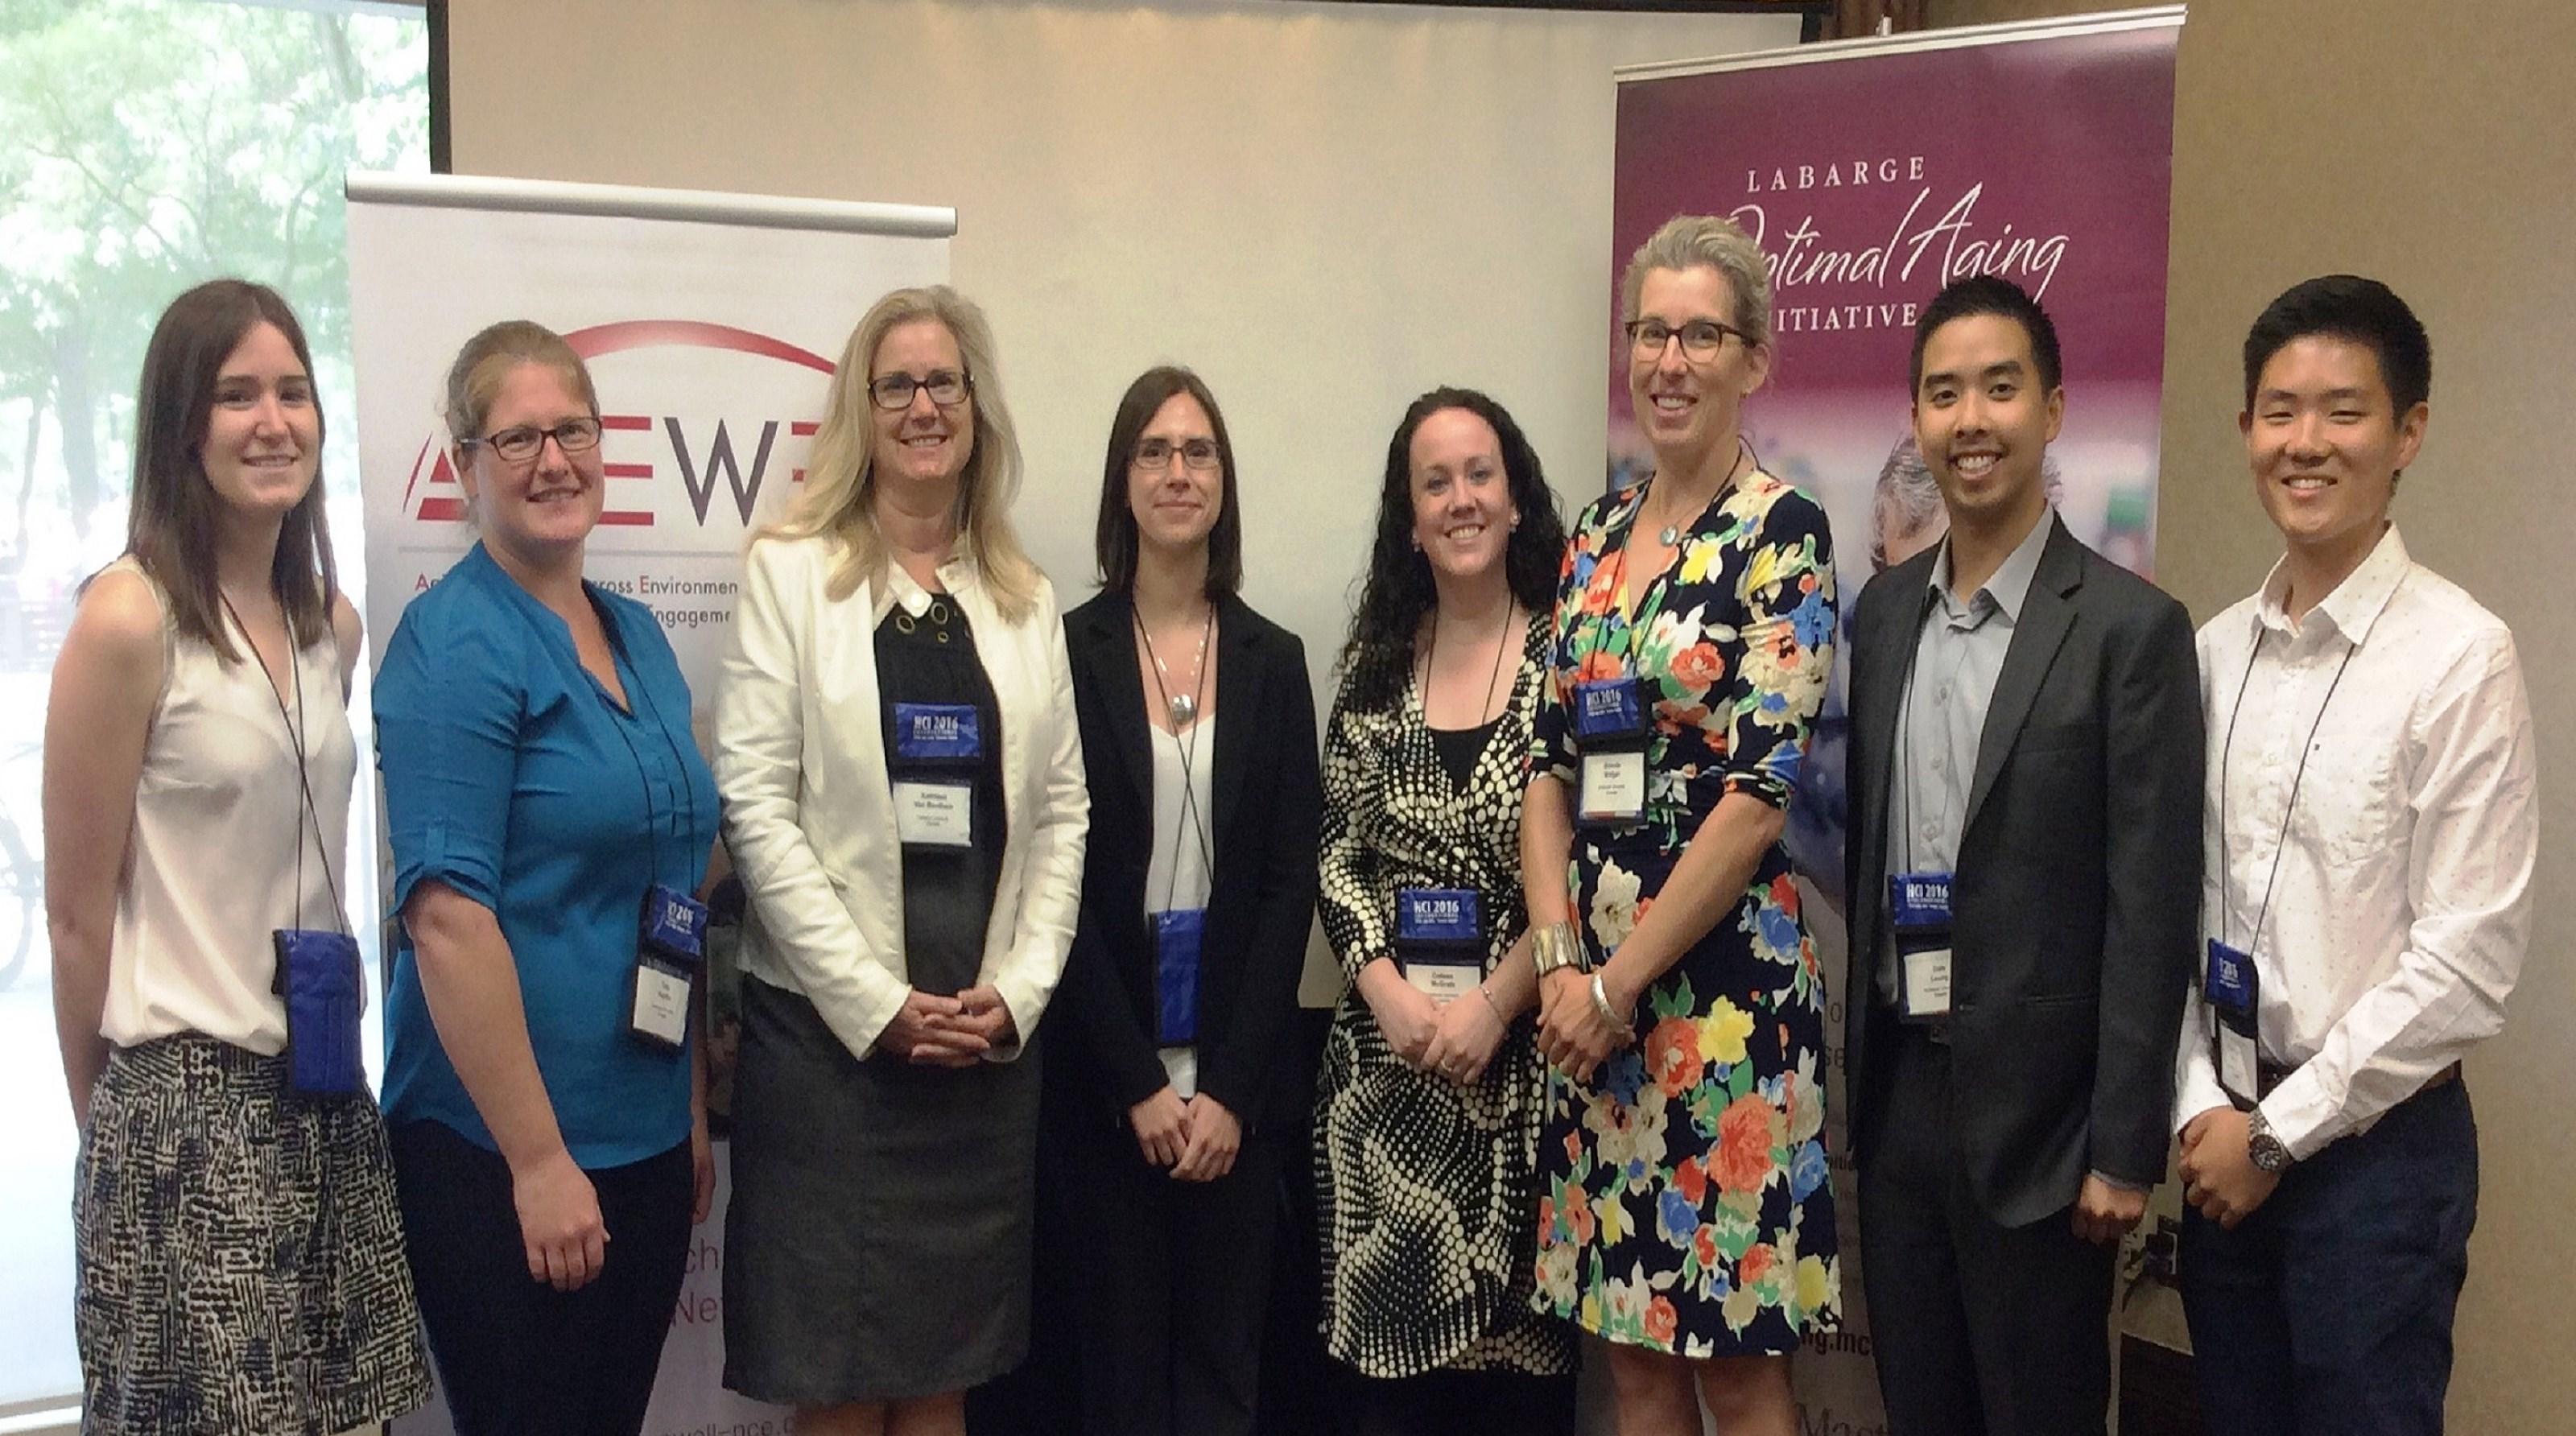 From left to right - Genevieve Foley (UofT), Tara Kajaks (Toronto Rehab Institute), Kathleen Van Benthem (Carleton University), Alexandra Mueller (McMaster University), Colleen McGrath (Ontario Shores), and Brenda Vrkljan, Dale Leung and Kyung Mun (McMaster University)